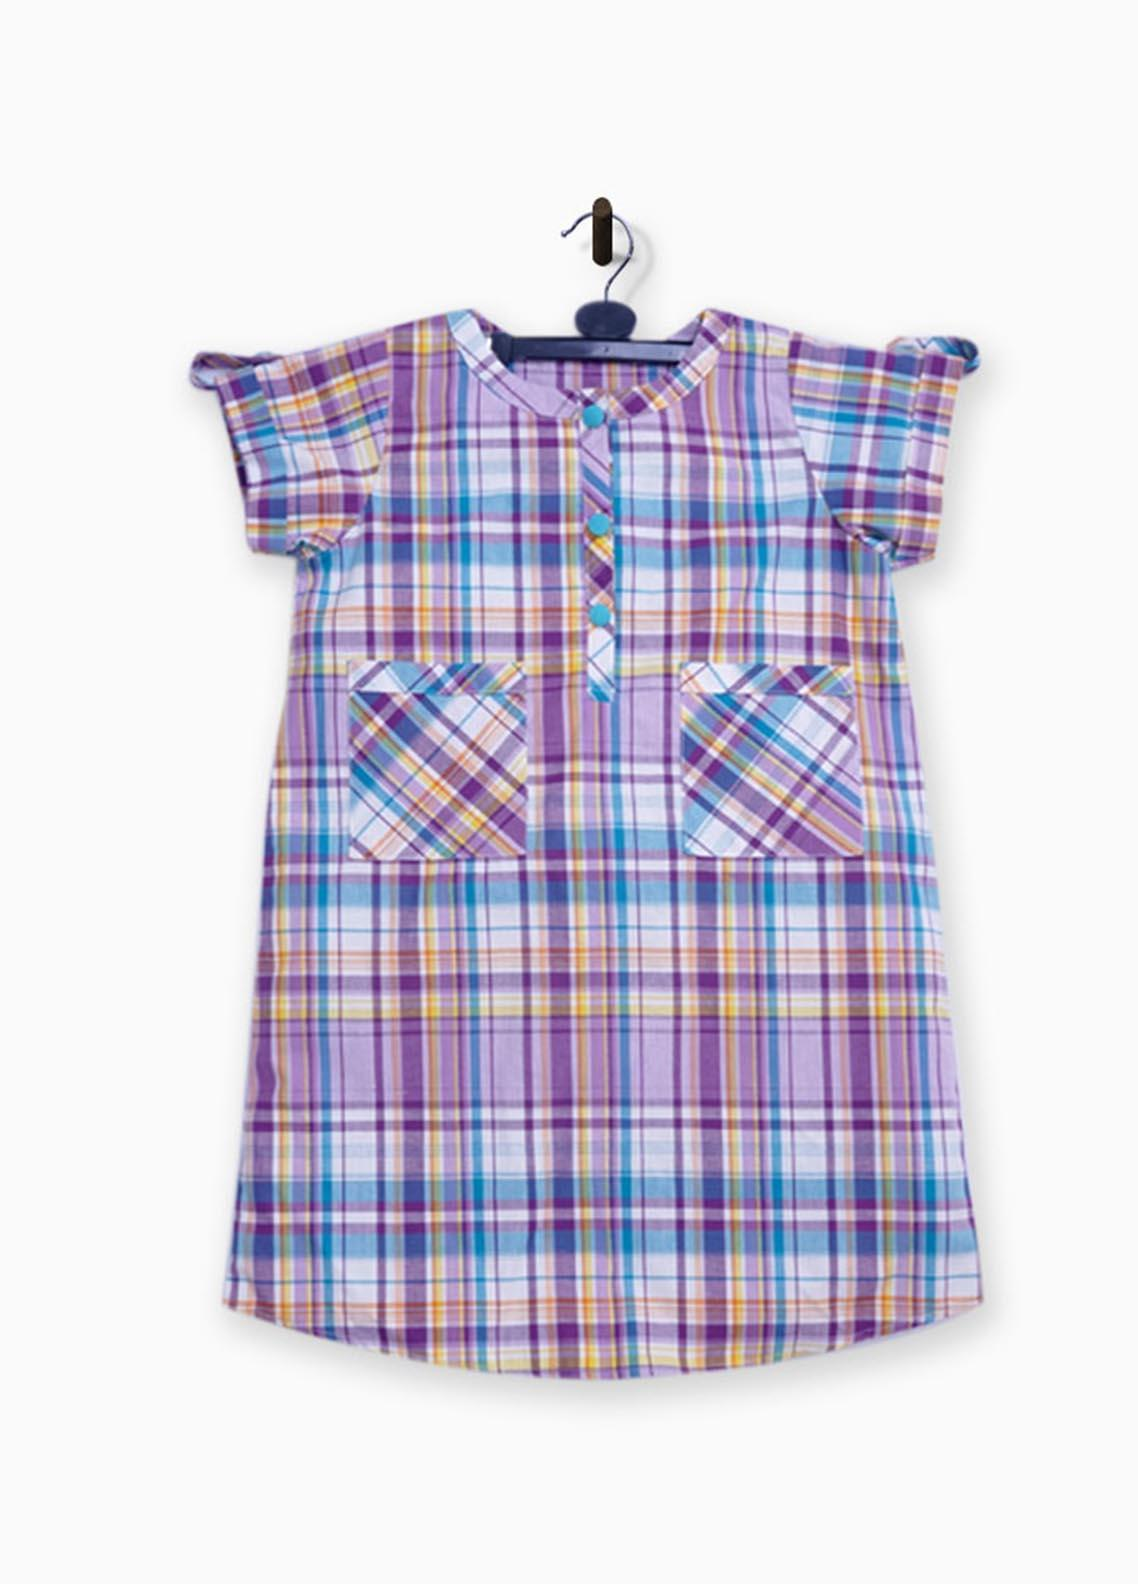 Kids Polo Cotton Fancy Shirts for Girls -  GWSK20221